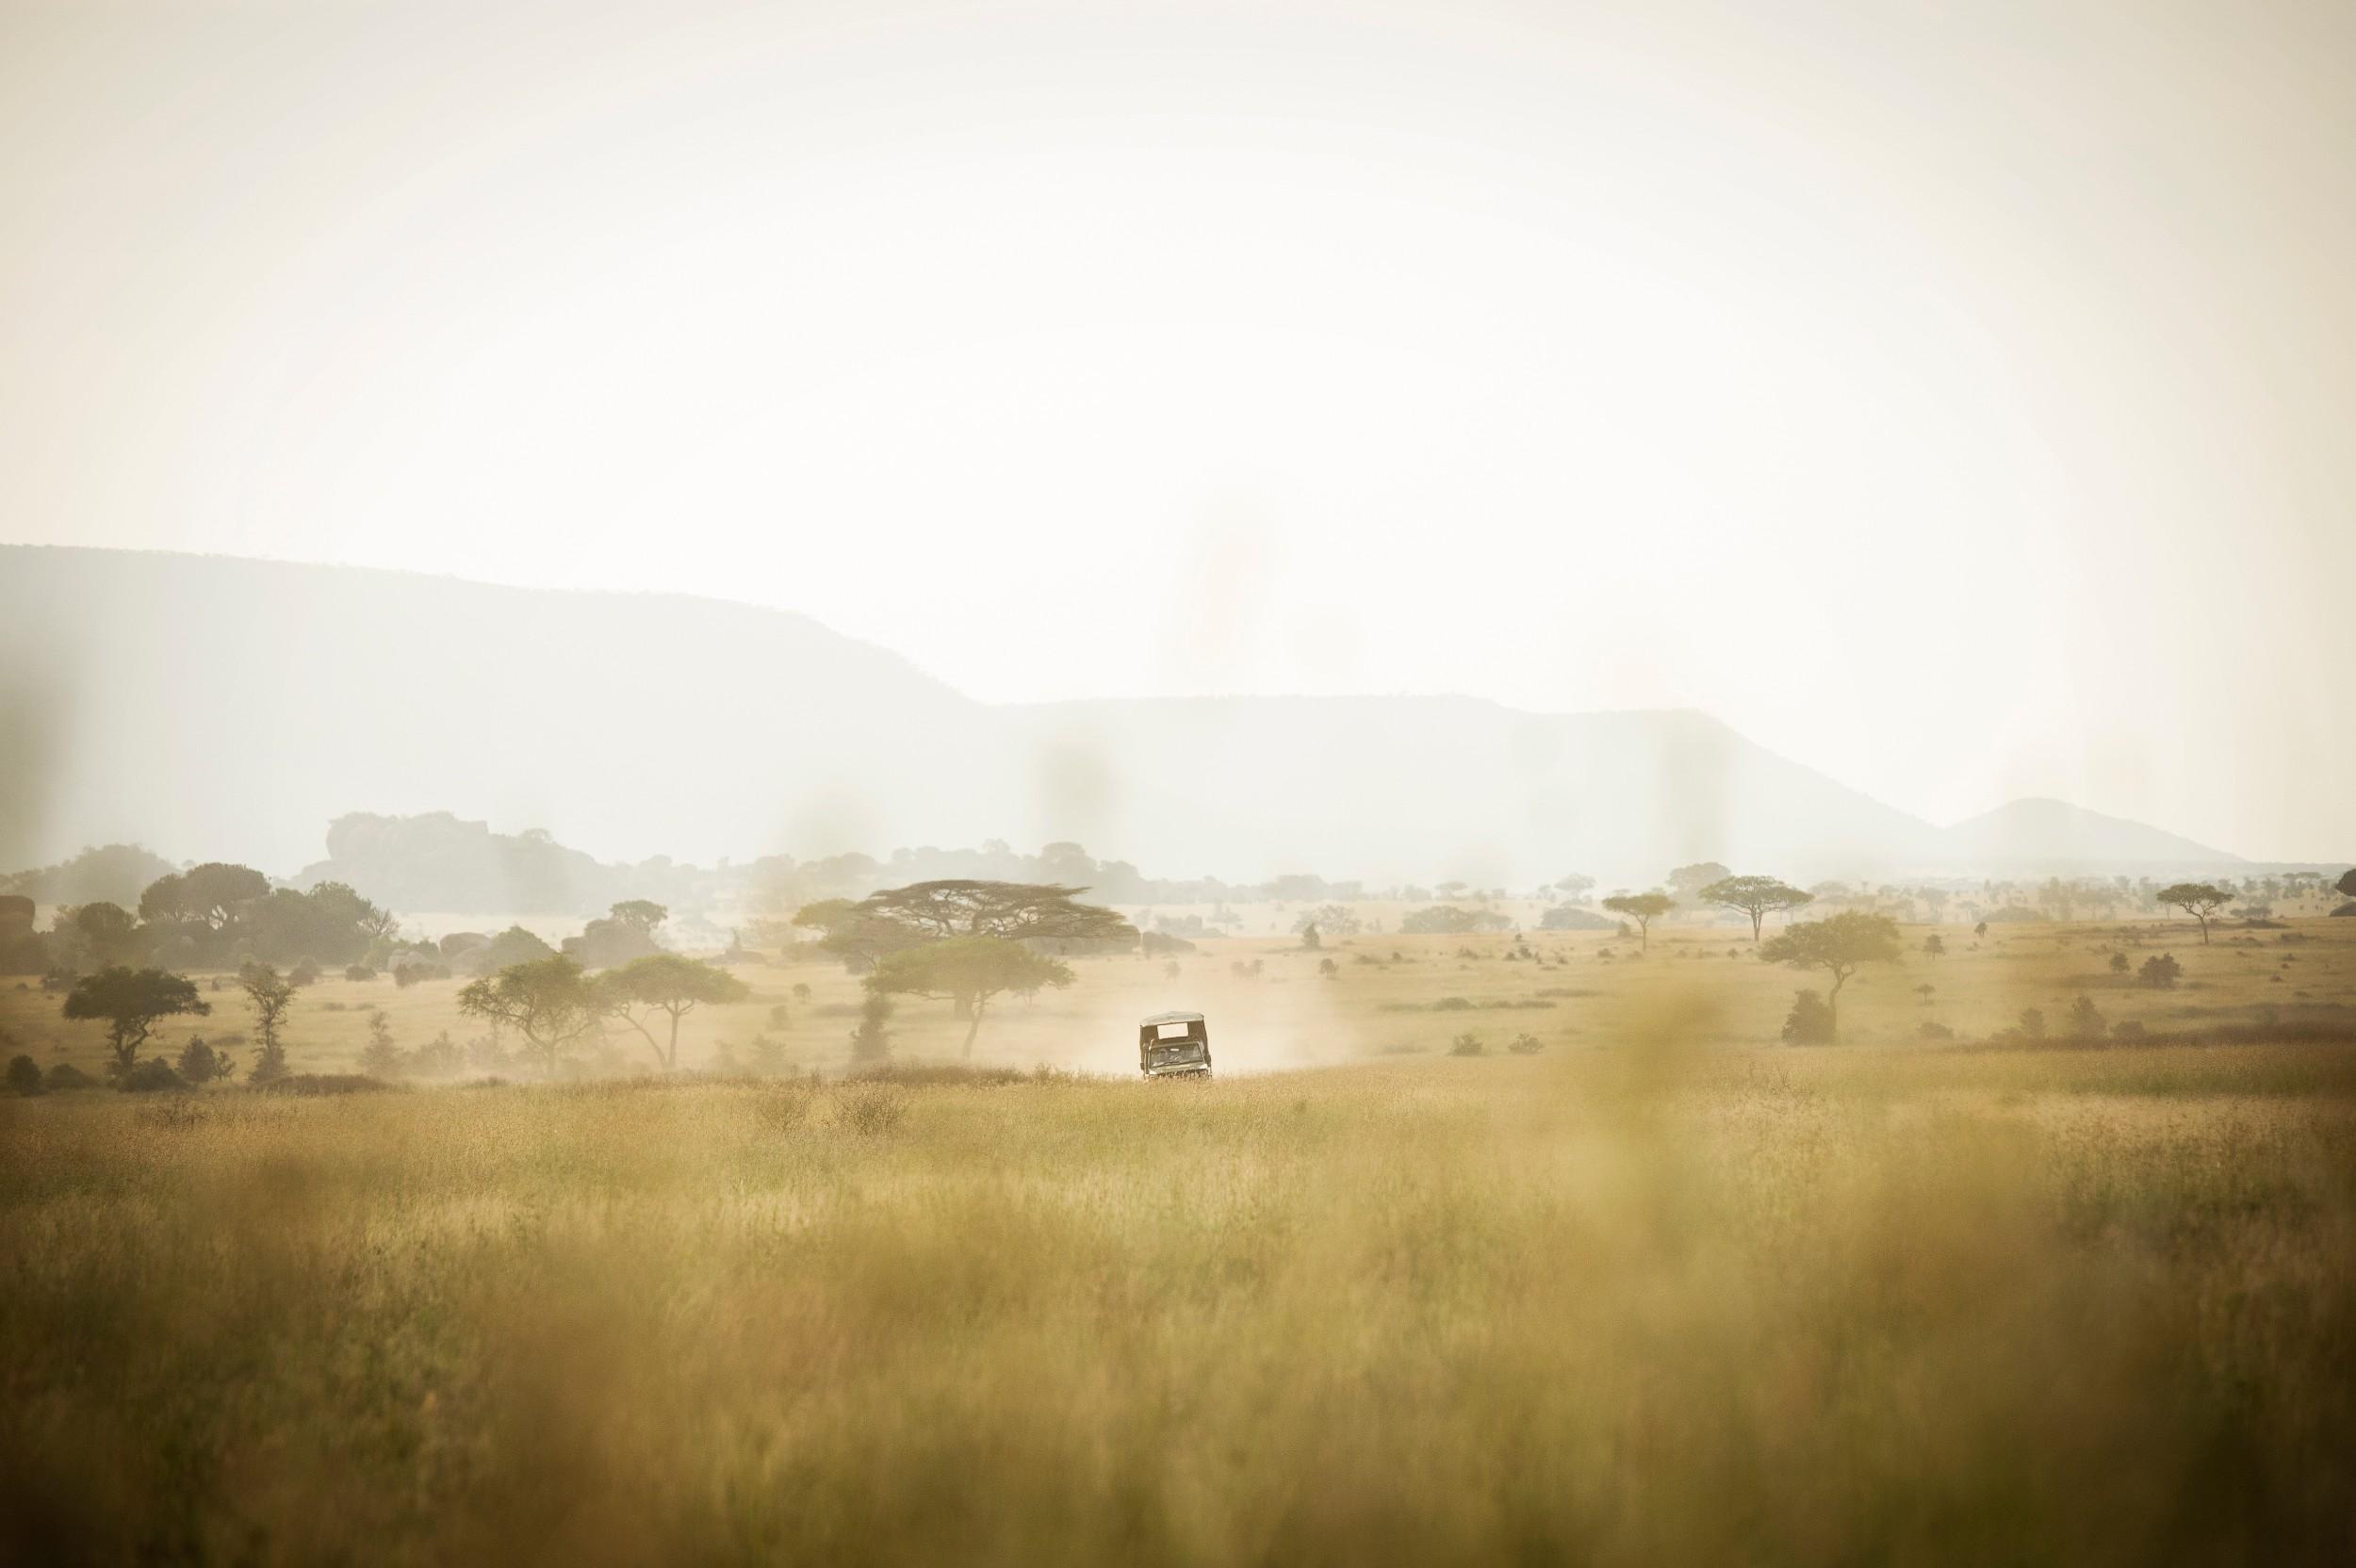 Dunia-Camp-game-drive-vehicle-2-HR-Eliza-Deacon.jpg